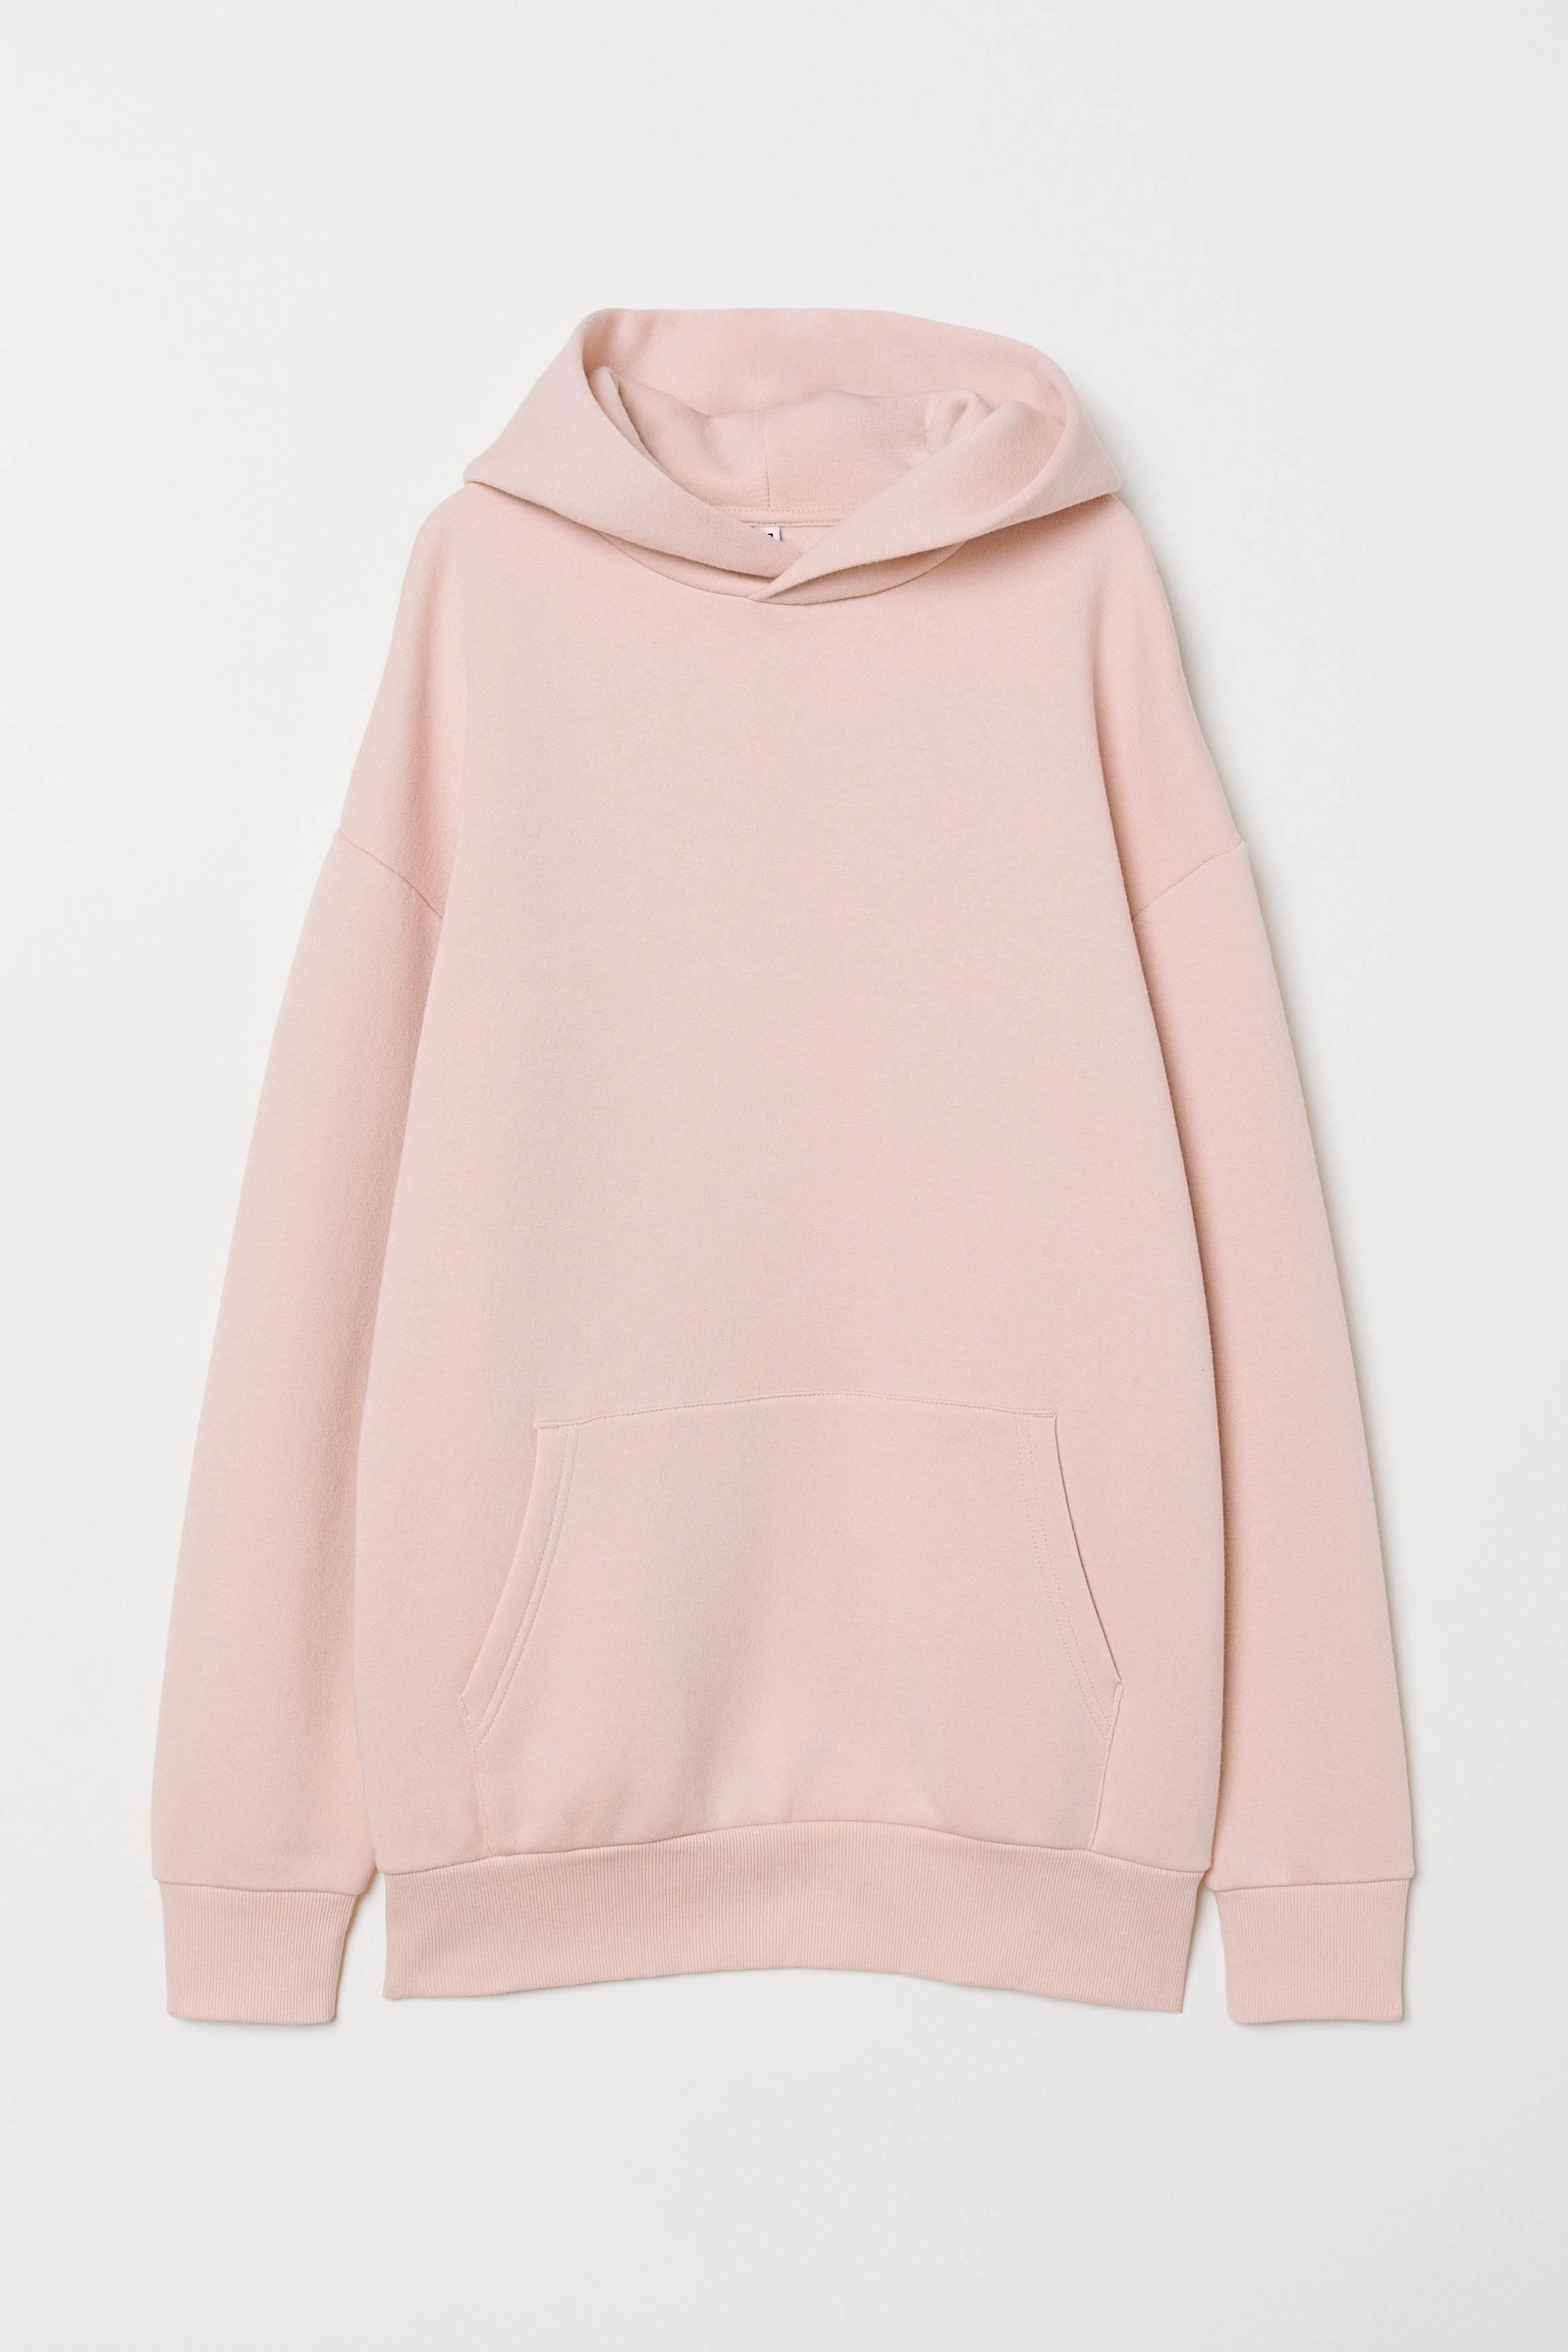 undefeated x amazing price various styles Oversized Hooded Sweatshirt